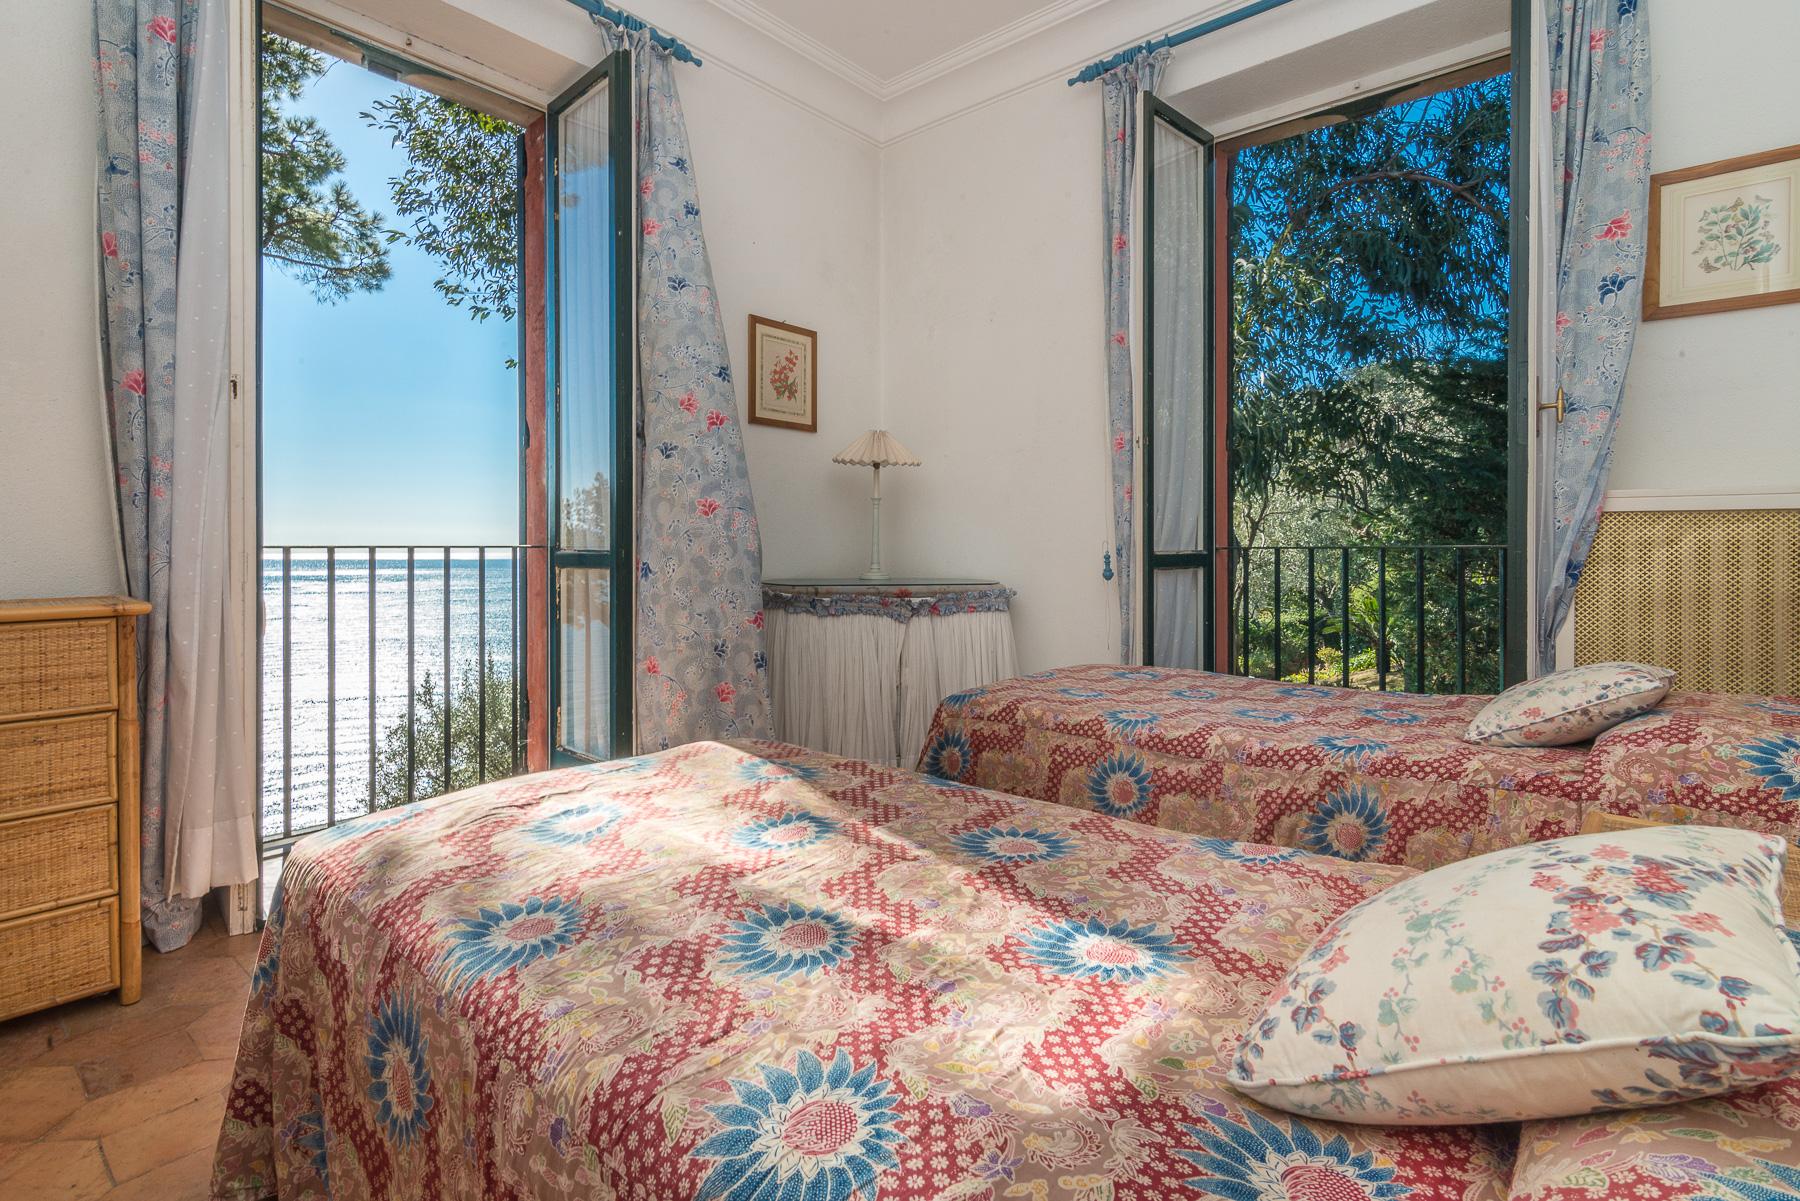 Villa in Vendita a Santa Margherita Ligure: 5 locali, 440 mq - Foto 14